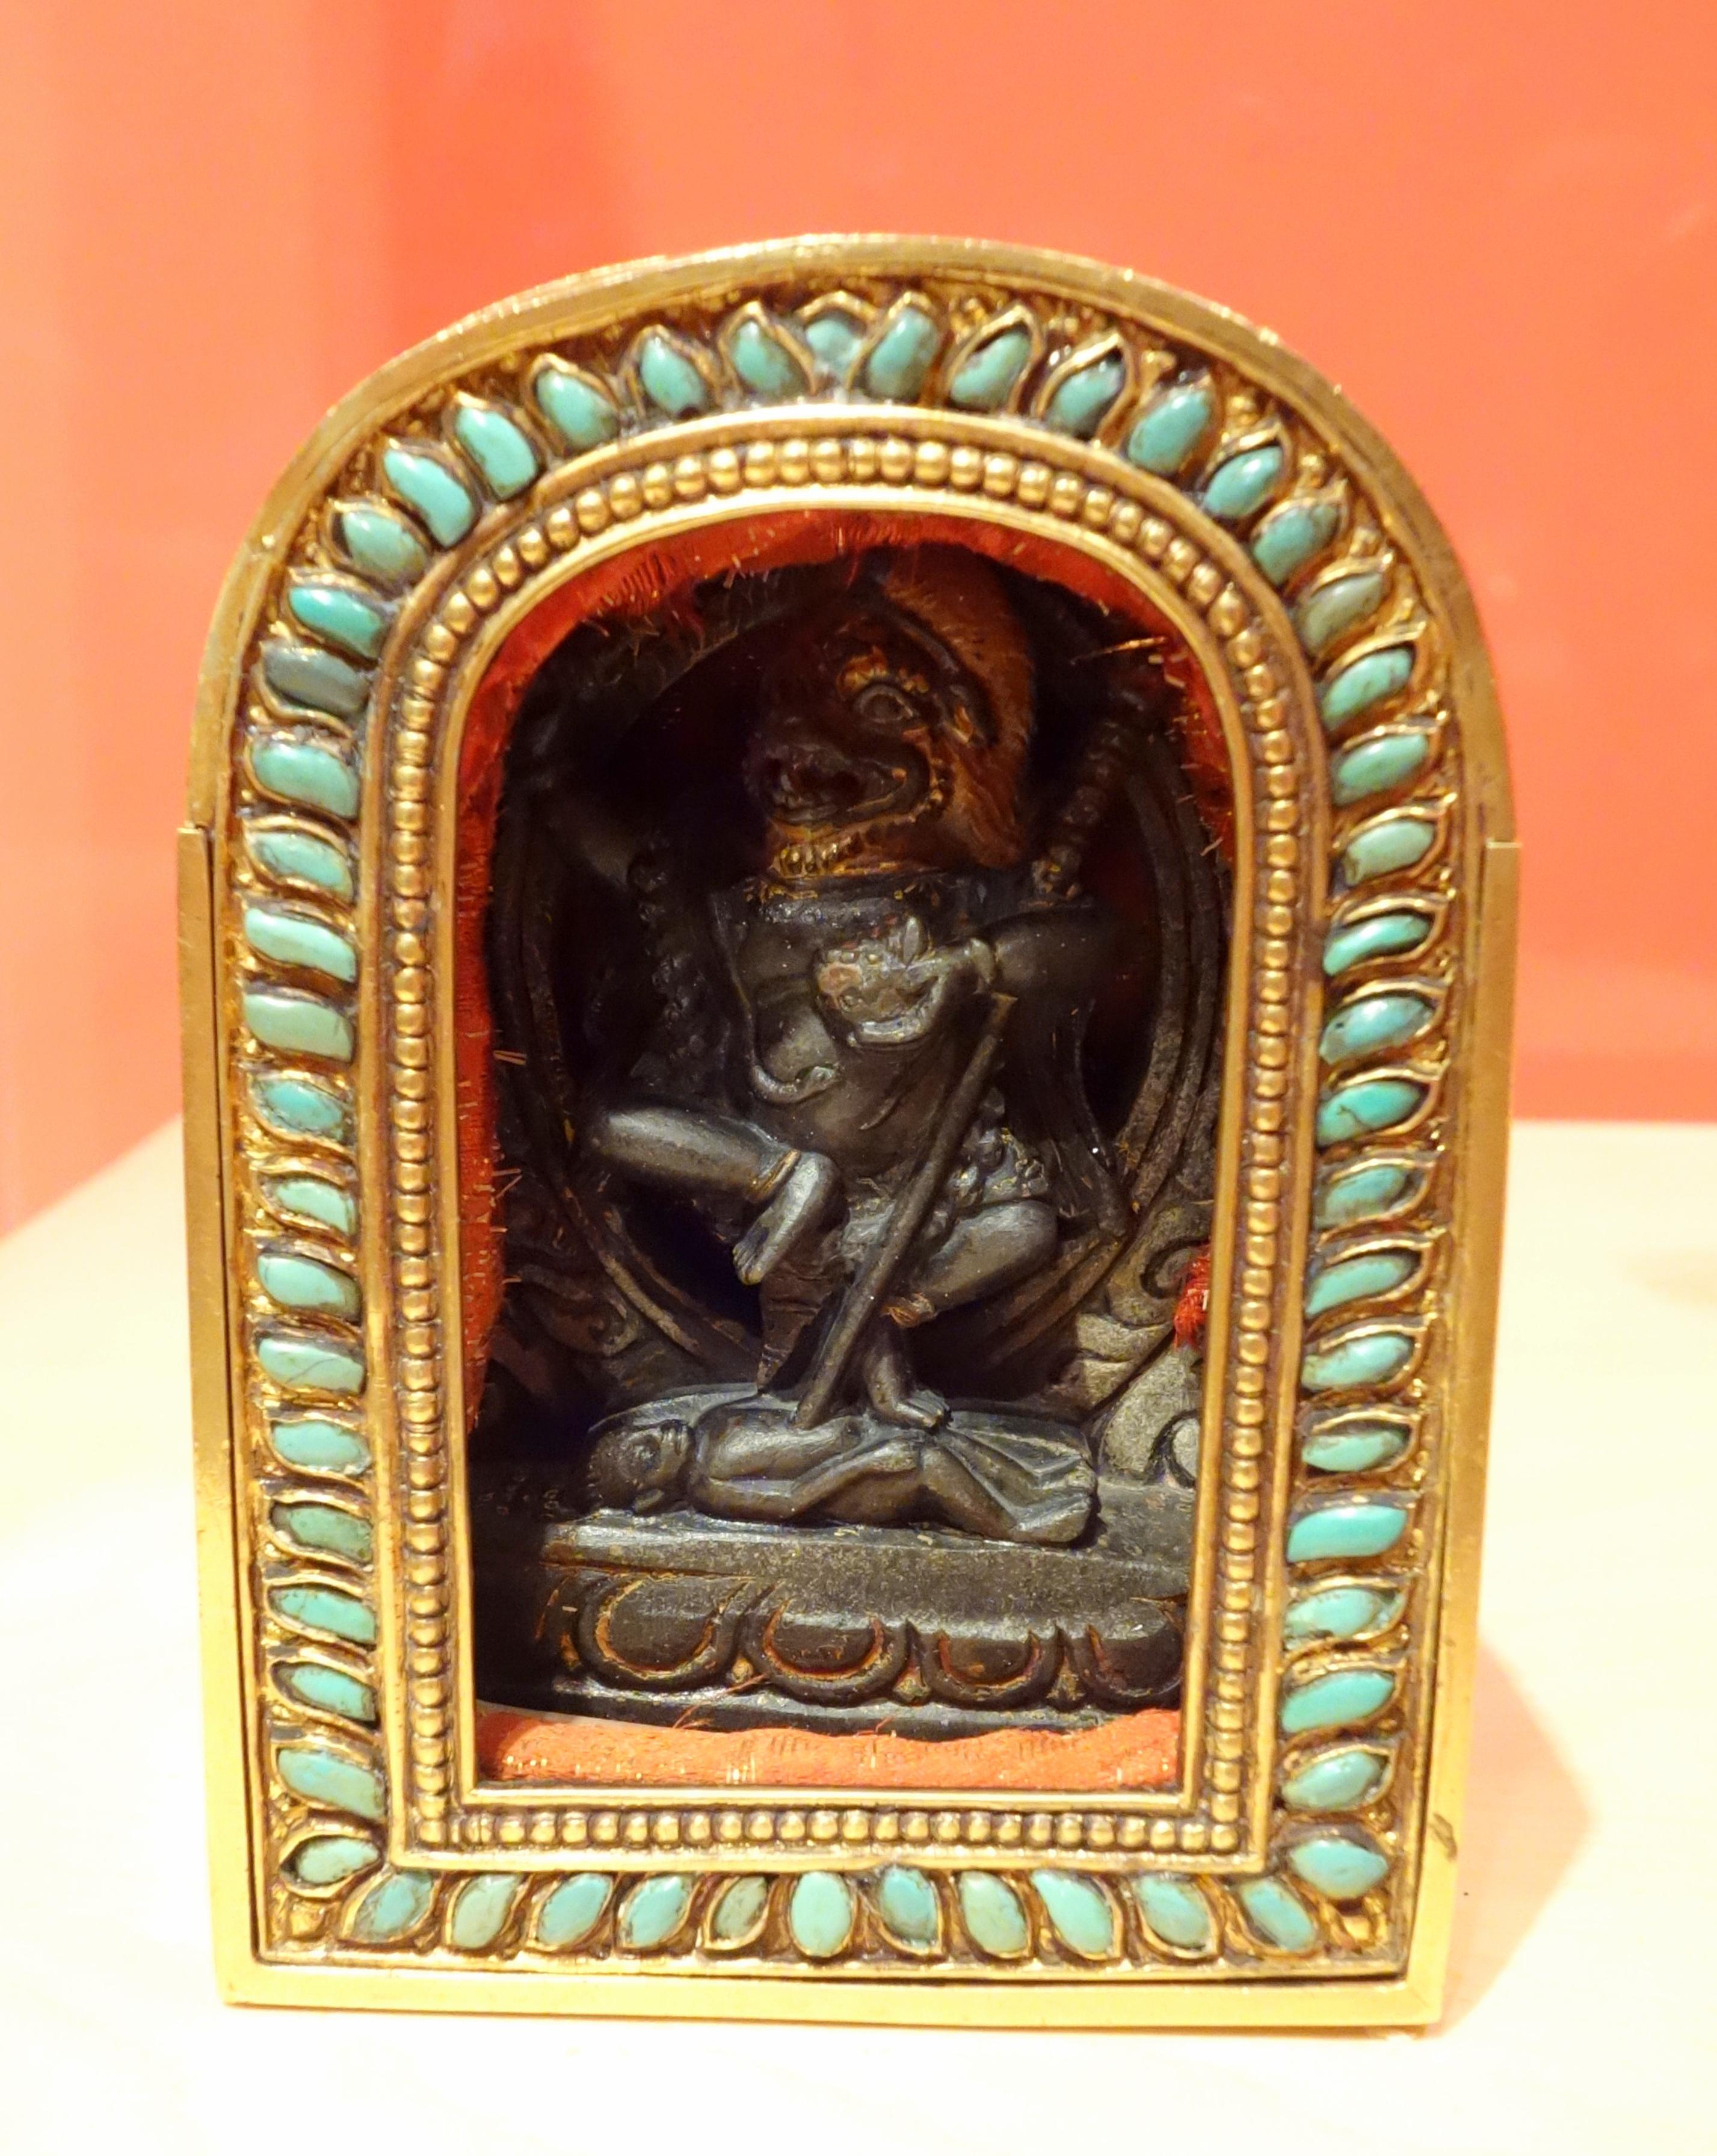 File:Gau, traveling shrine with image of Simhavaktra, Tibet